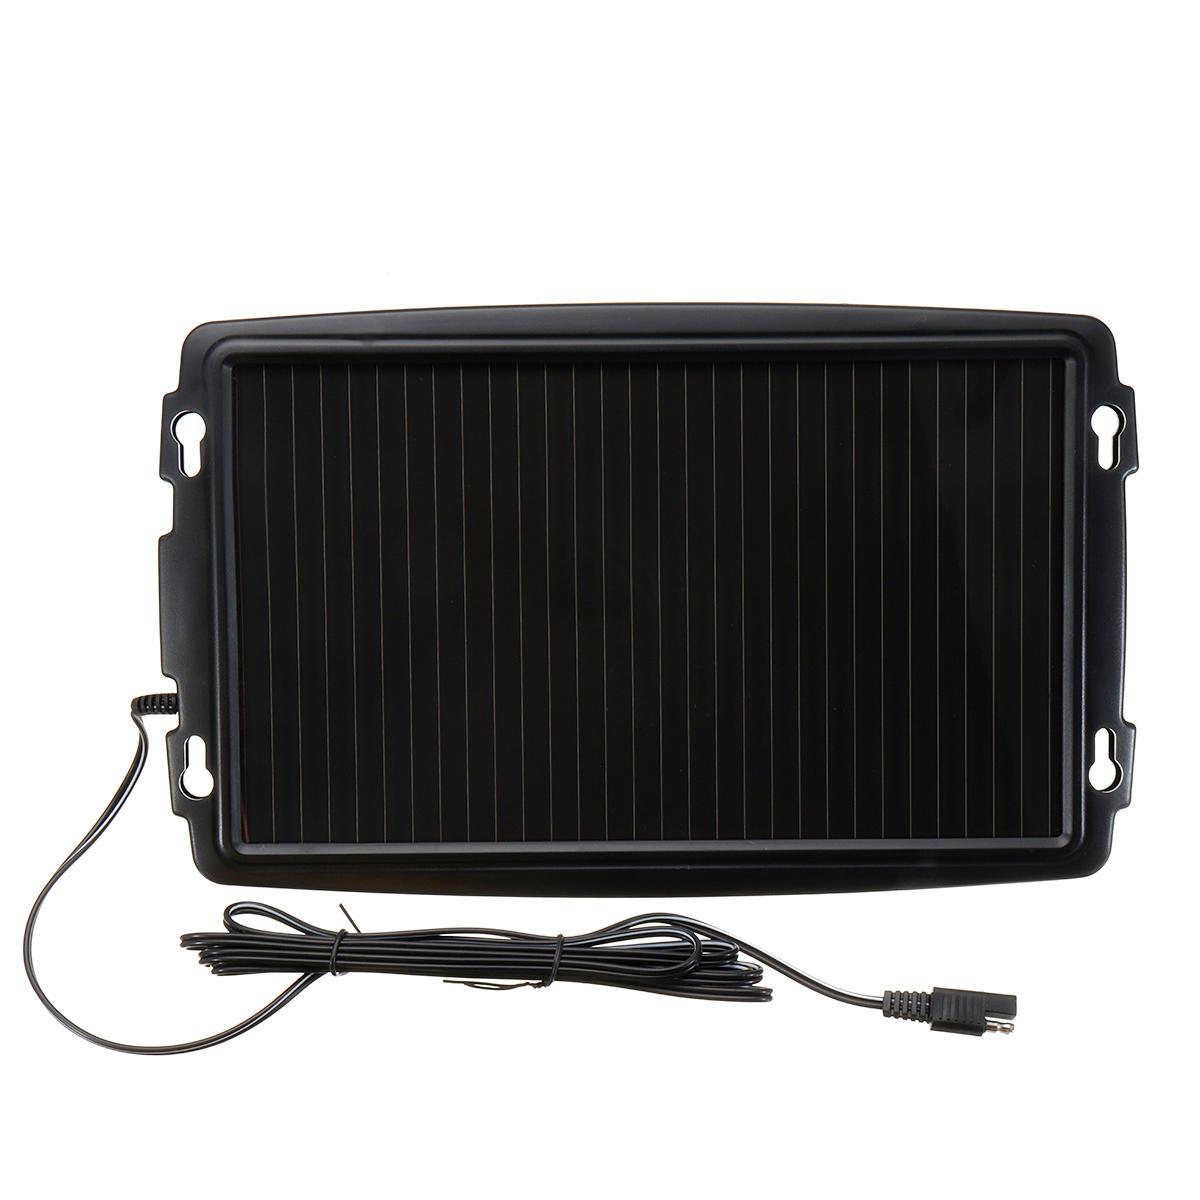 18V 2.4W Solar Panel Battery Charger Backup For Car Boat Caravan Power Supply